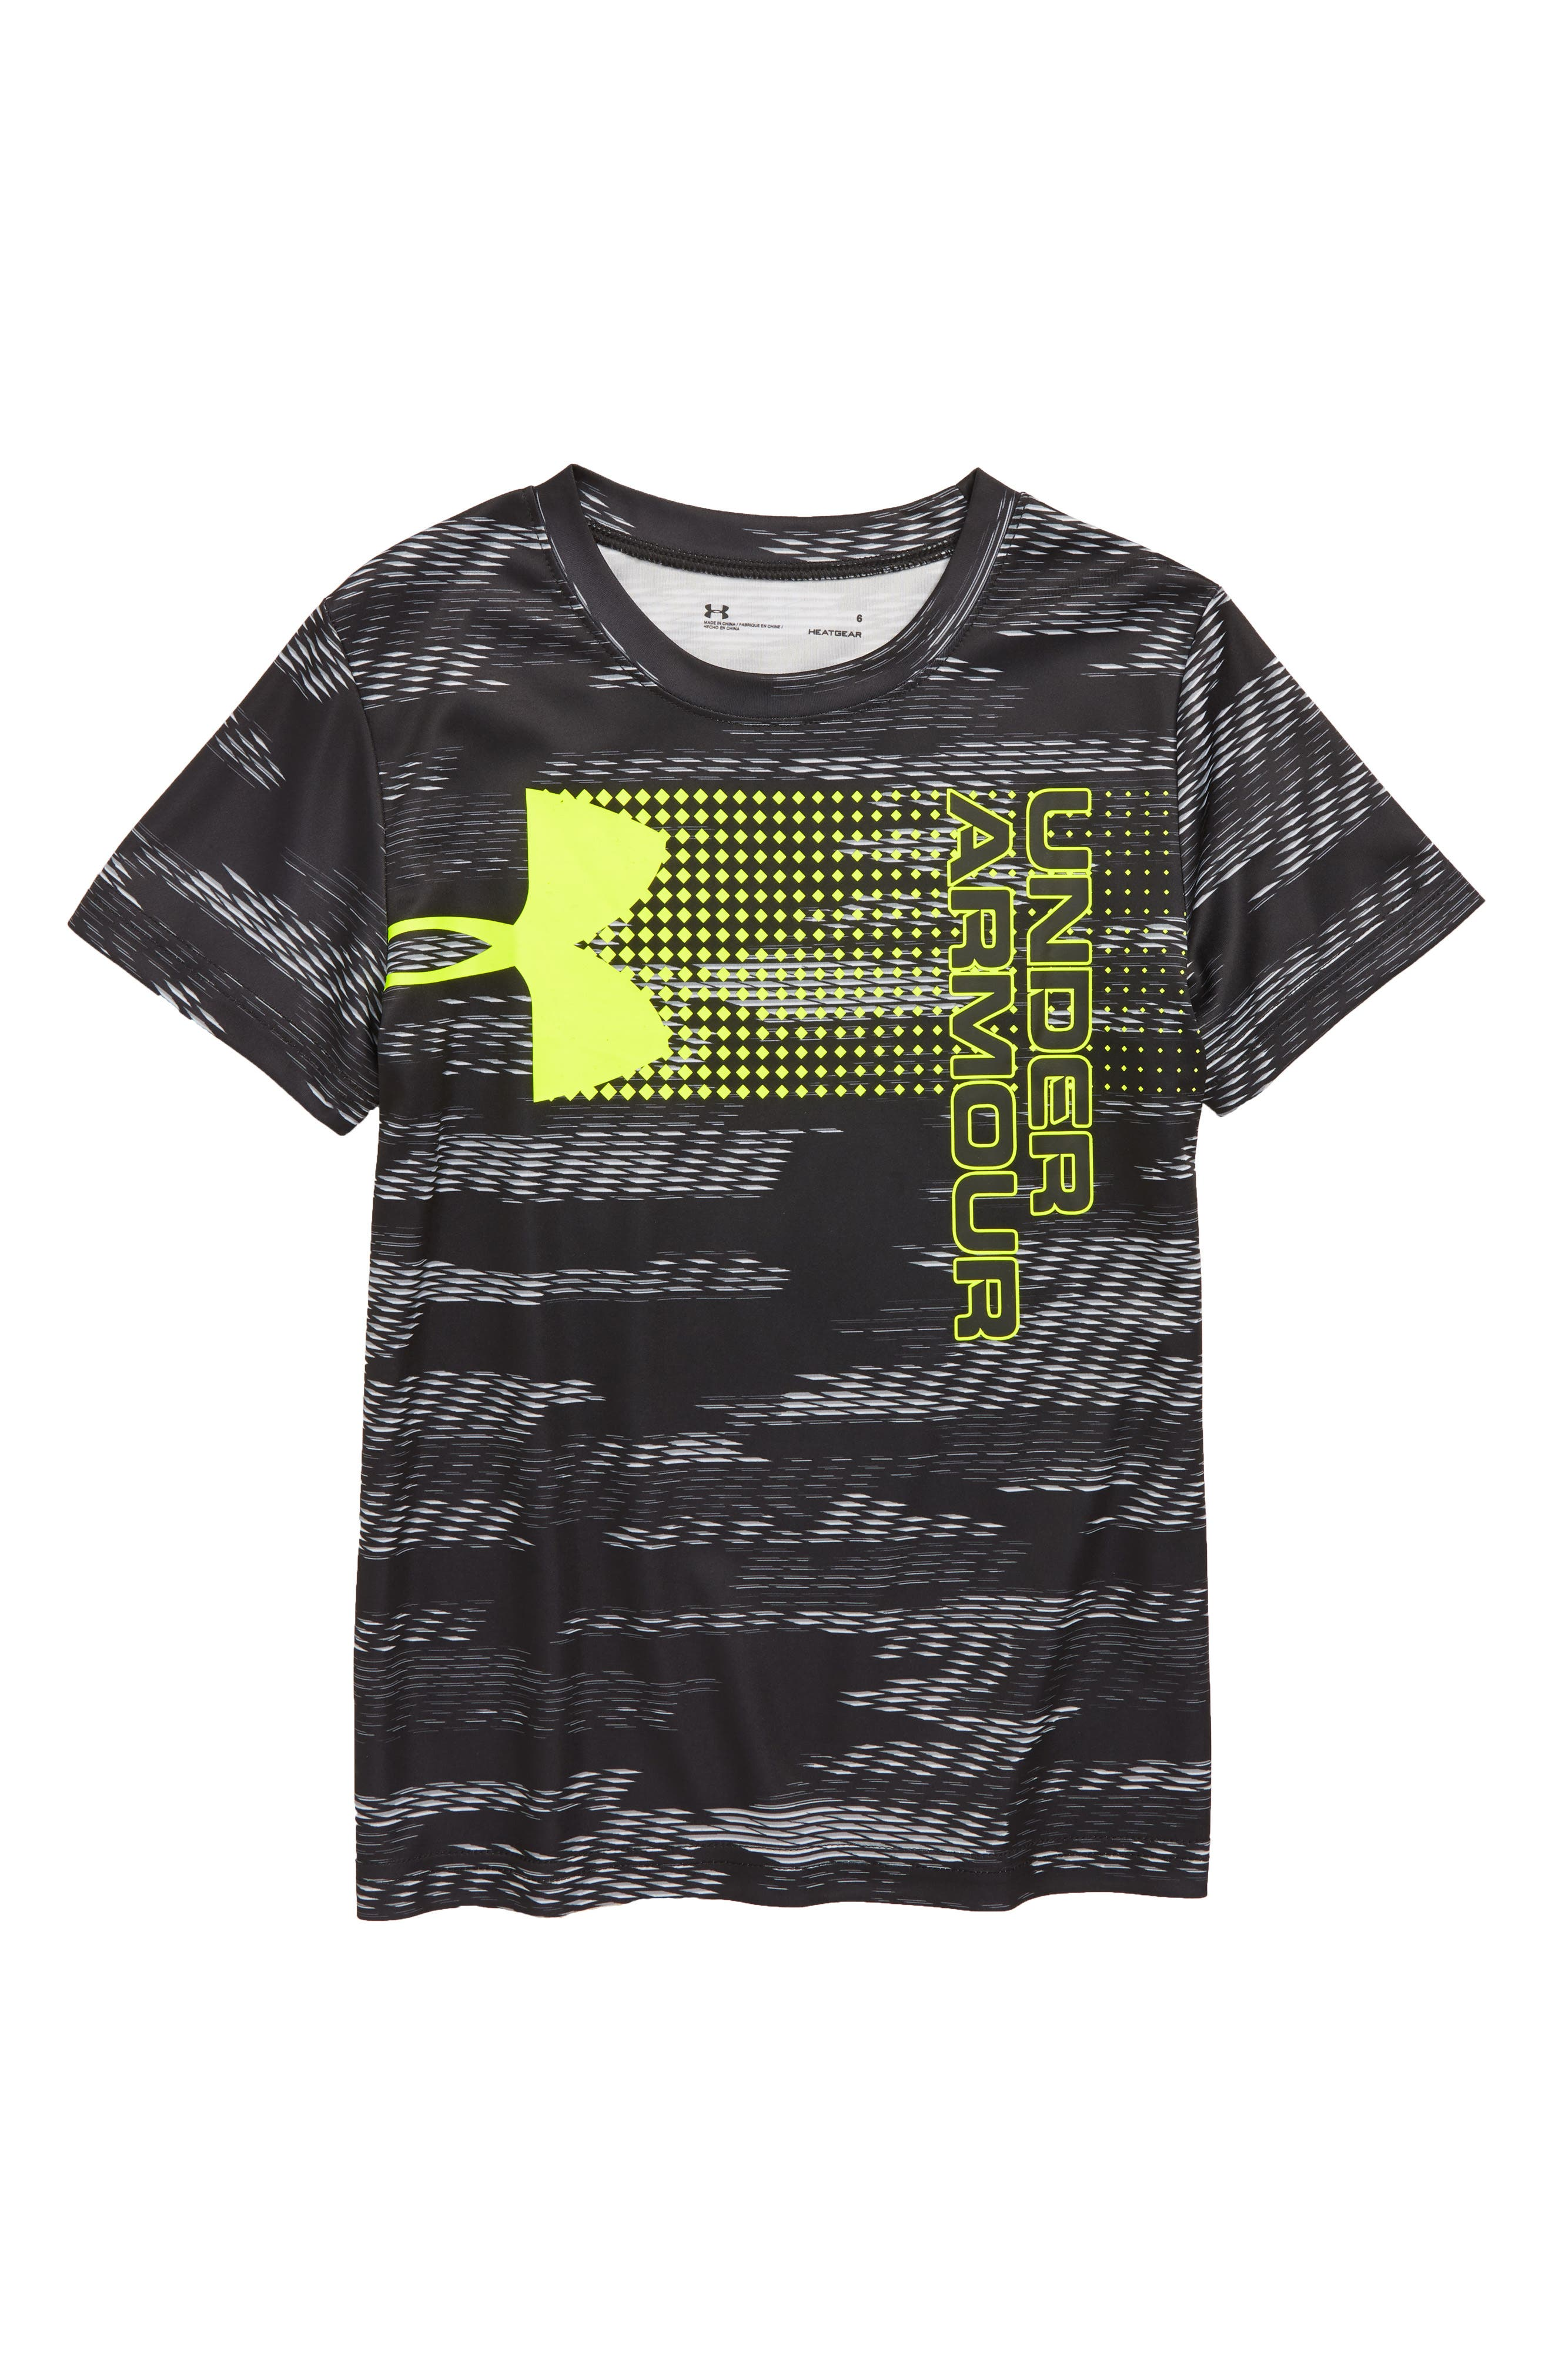 Trave Hybrid Shirt,                             Main thumbnail 1, color,                             BLACK